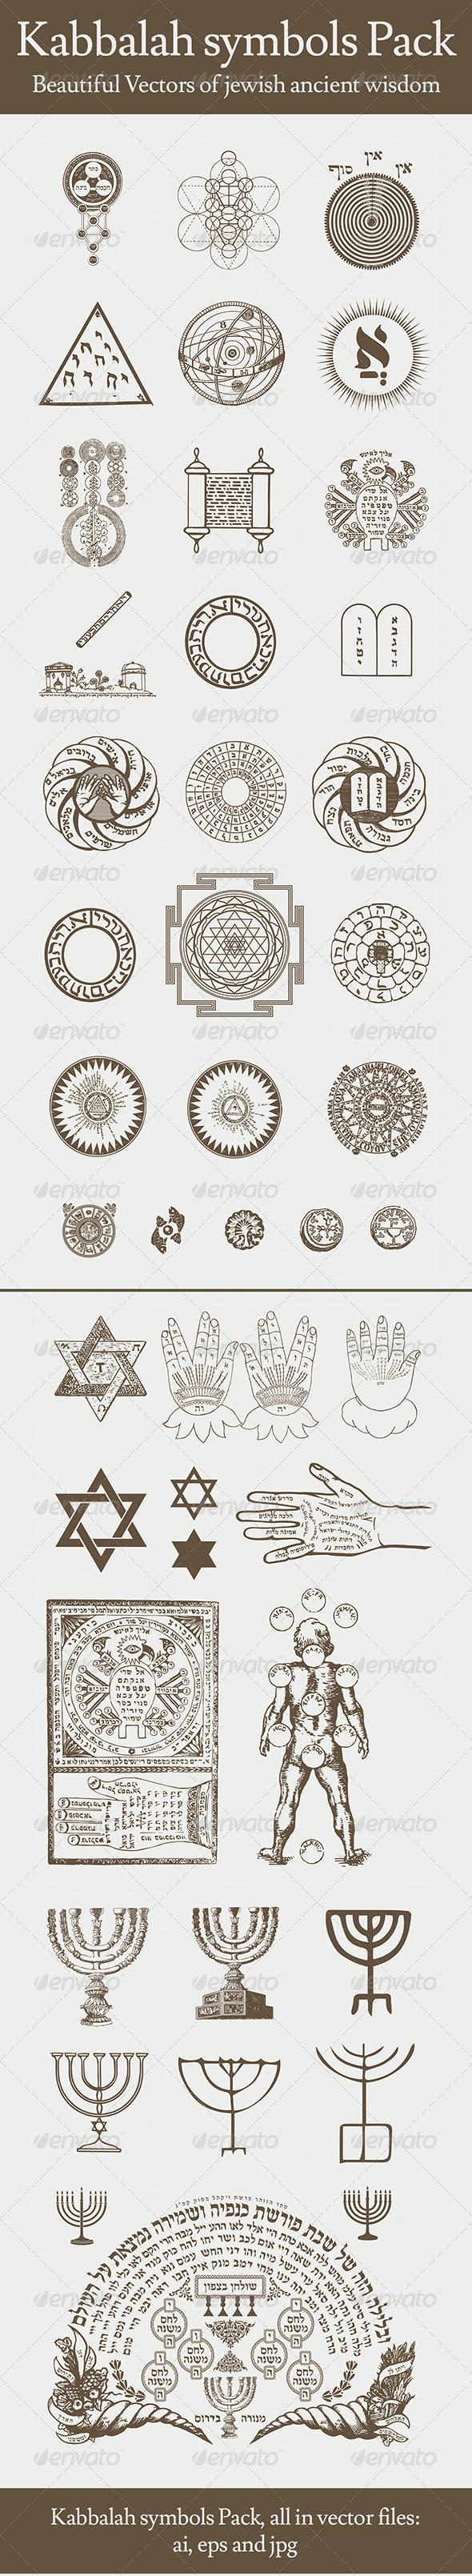 GraphicRiver Kabbalah Symbols Pack 6427735